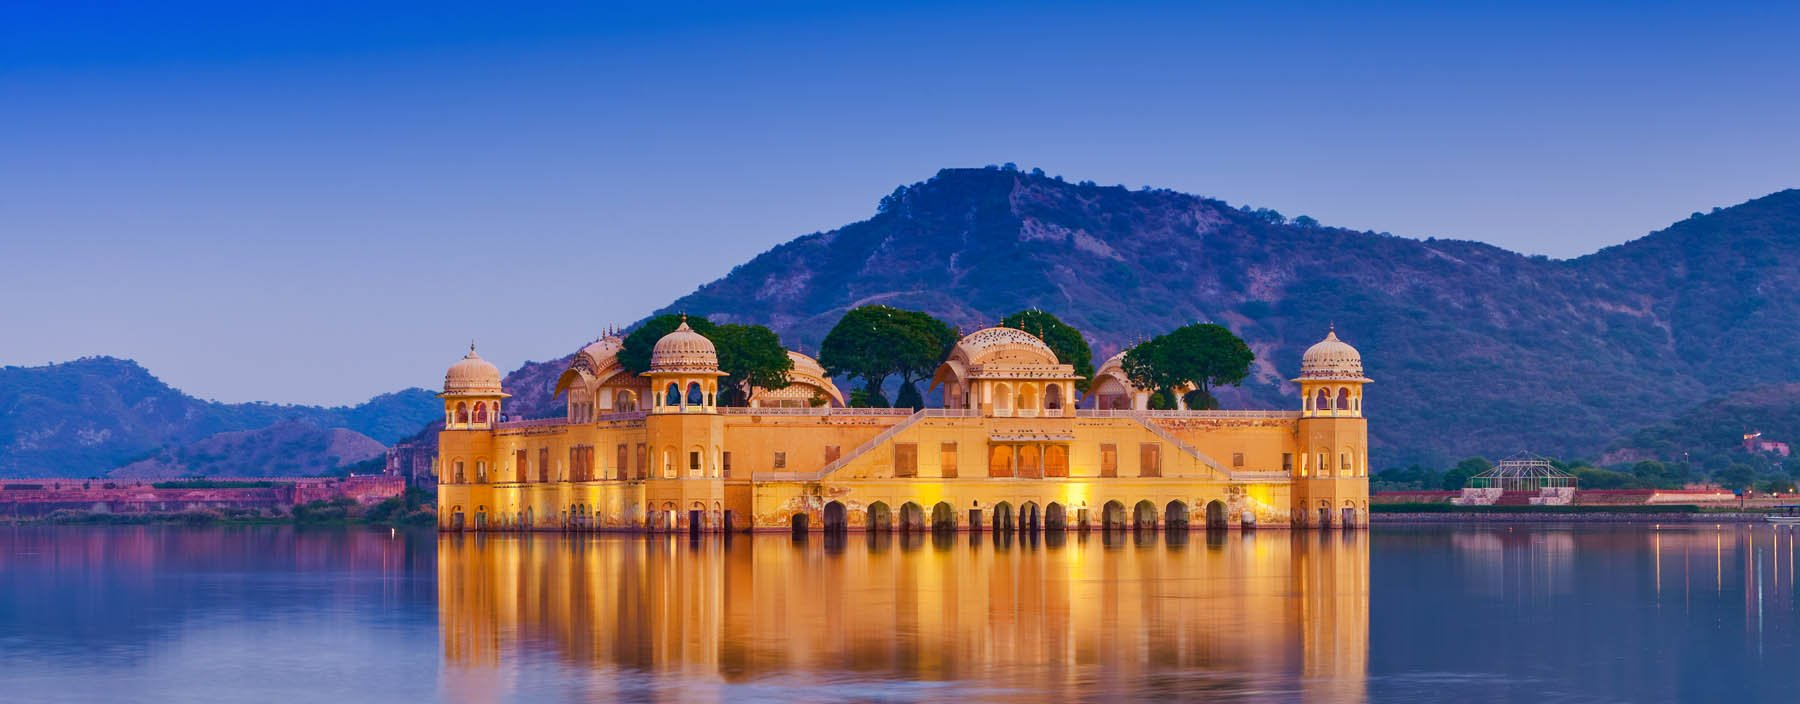 in, jaipur, the palace jal mahal.jpg